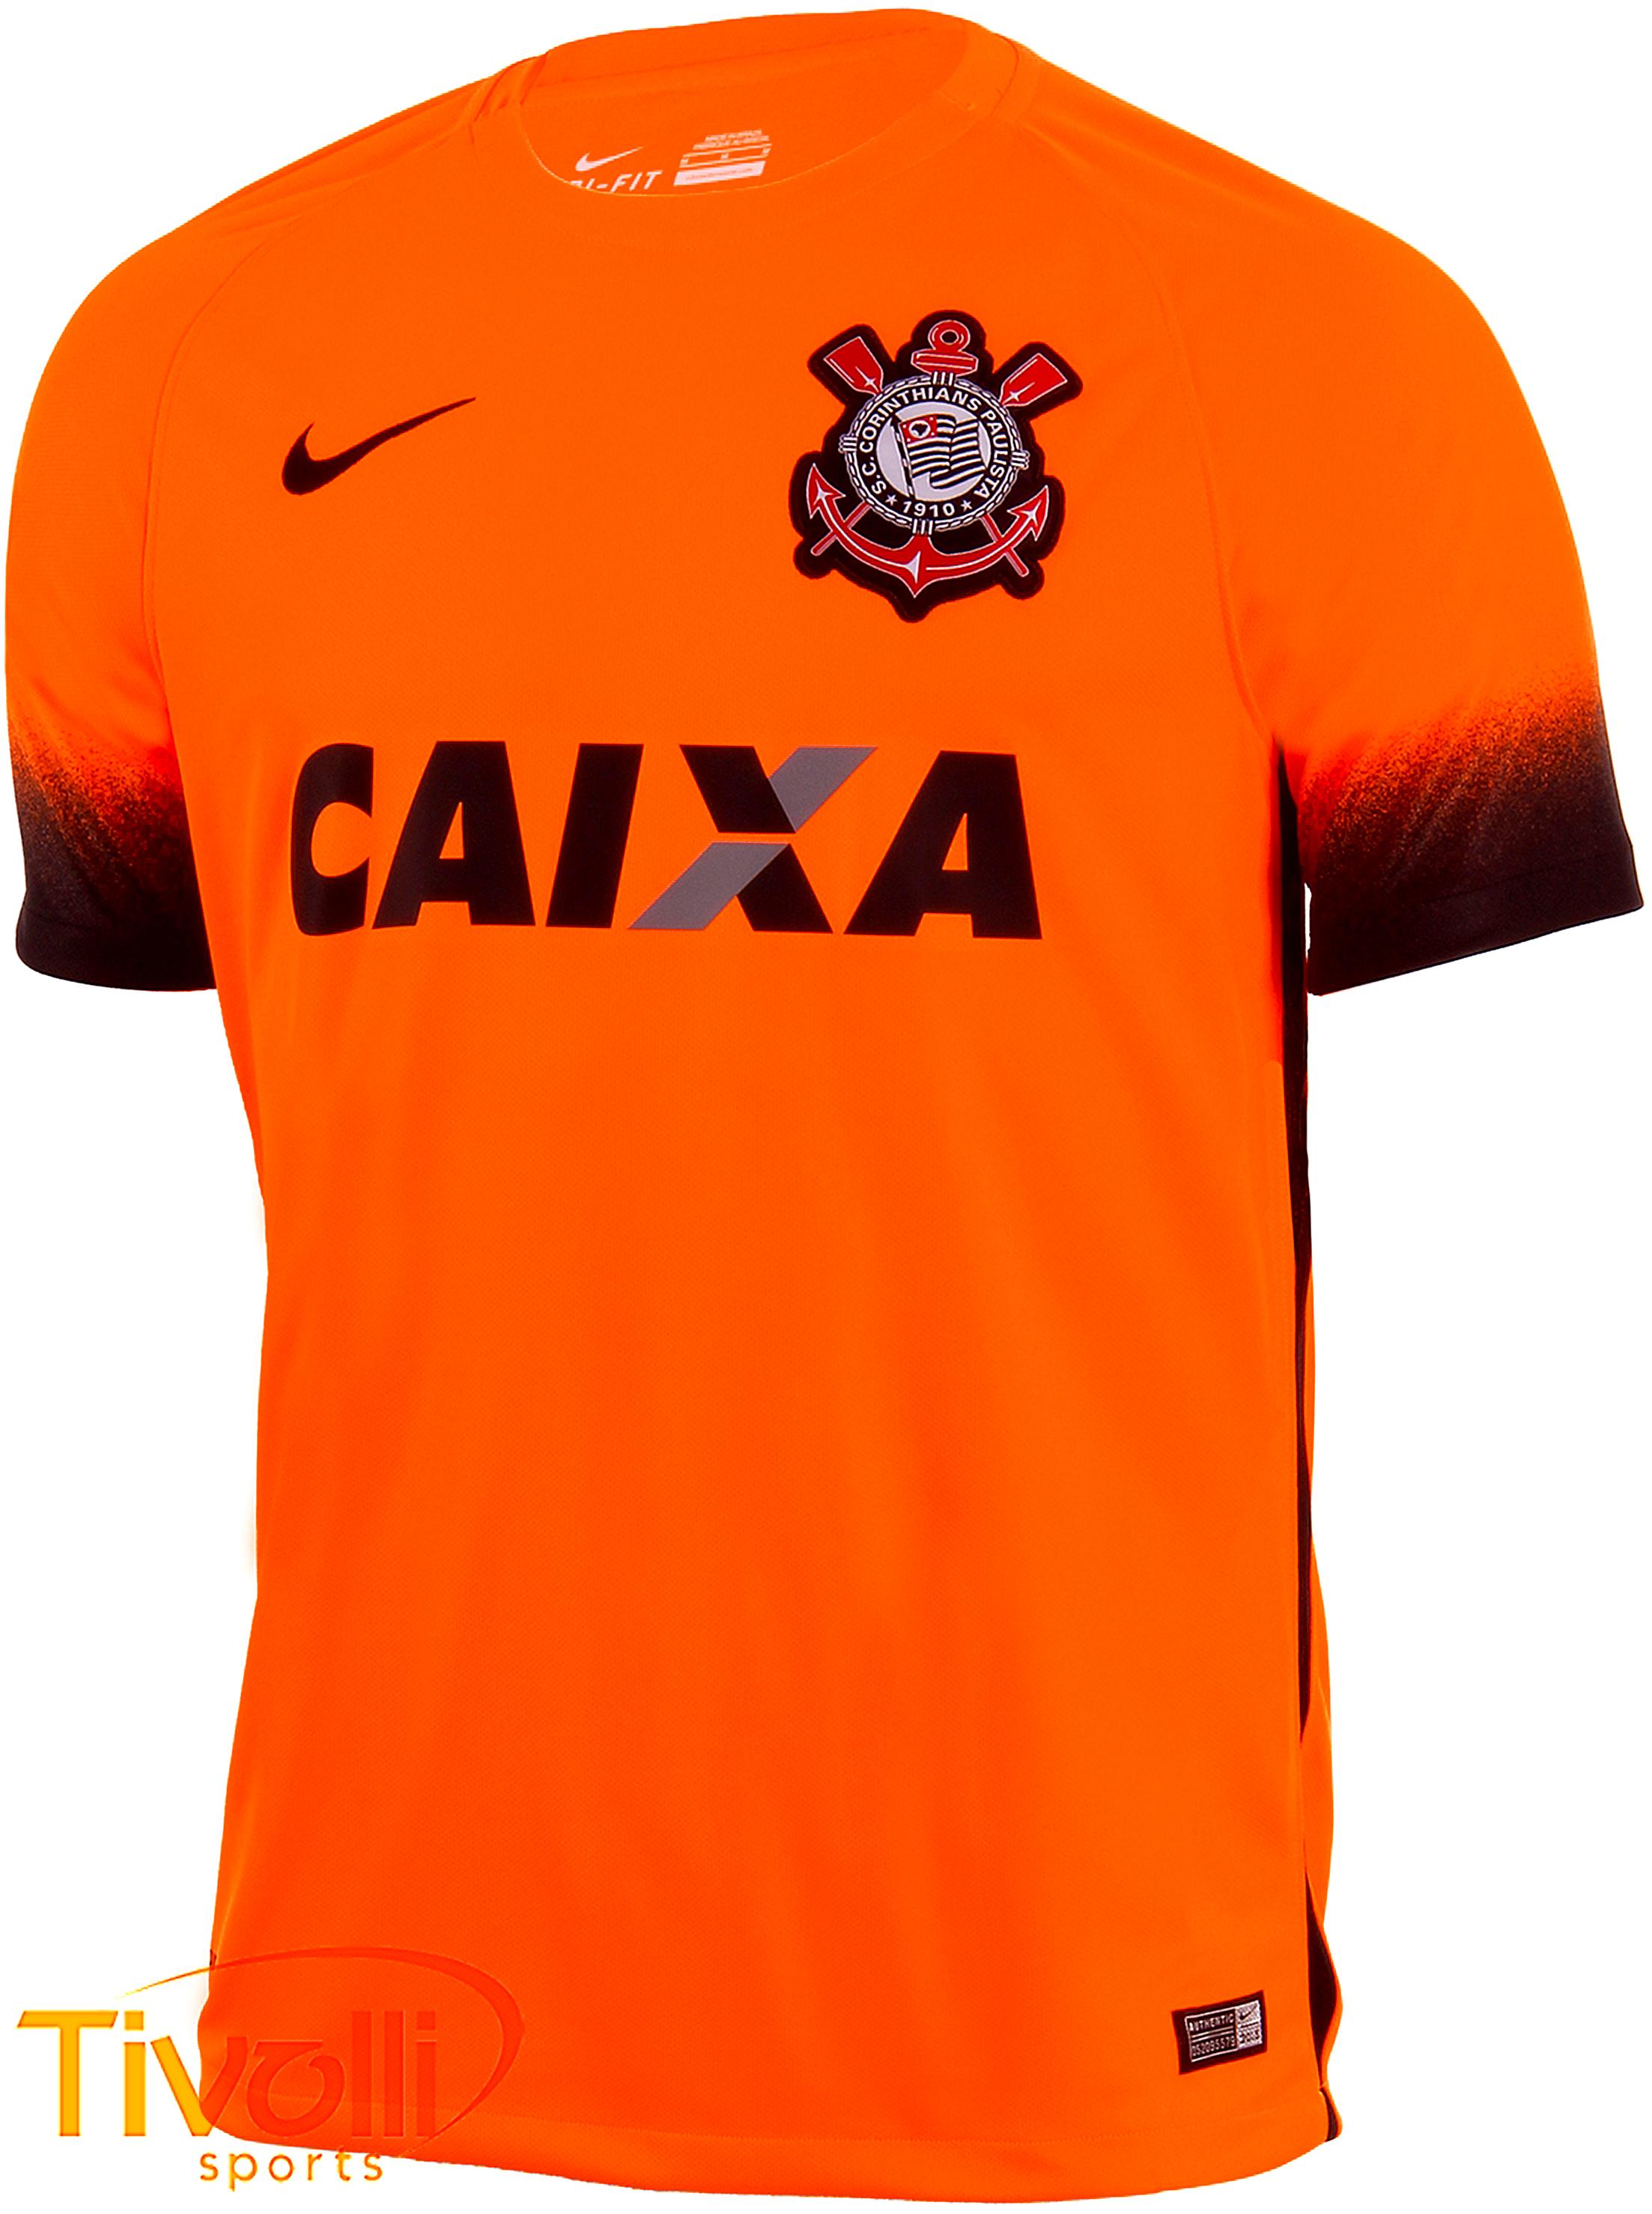 3dcbdf23b41c3 Black Friday - Camisa Corinthians III Nike torcedor 2015 2016 masculina  laranja e preta